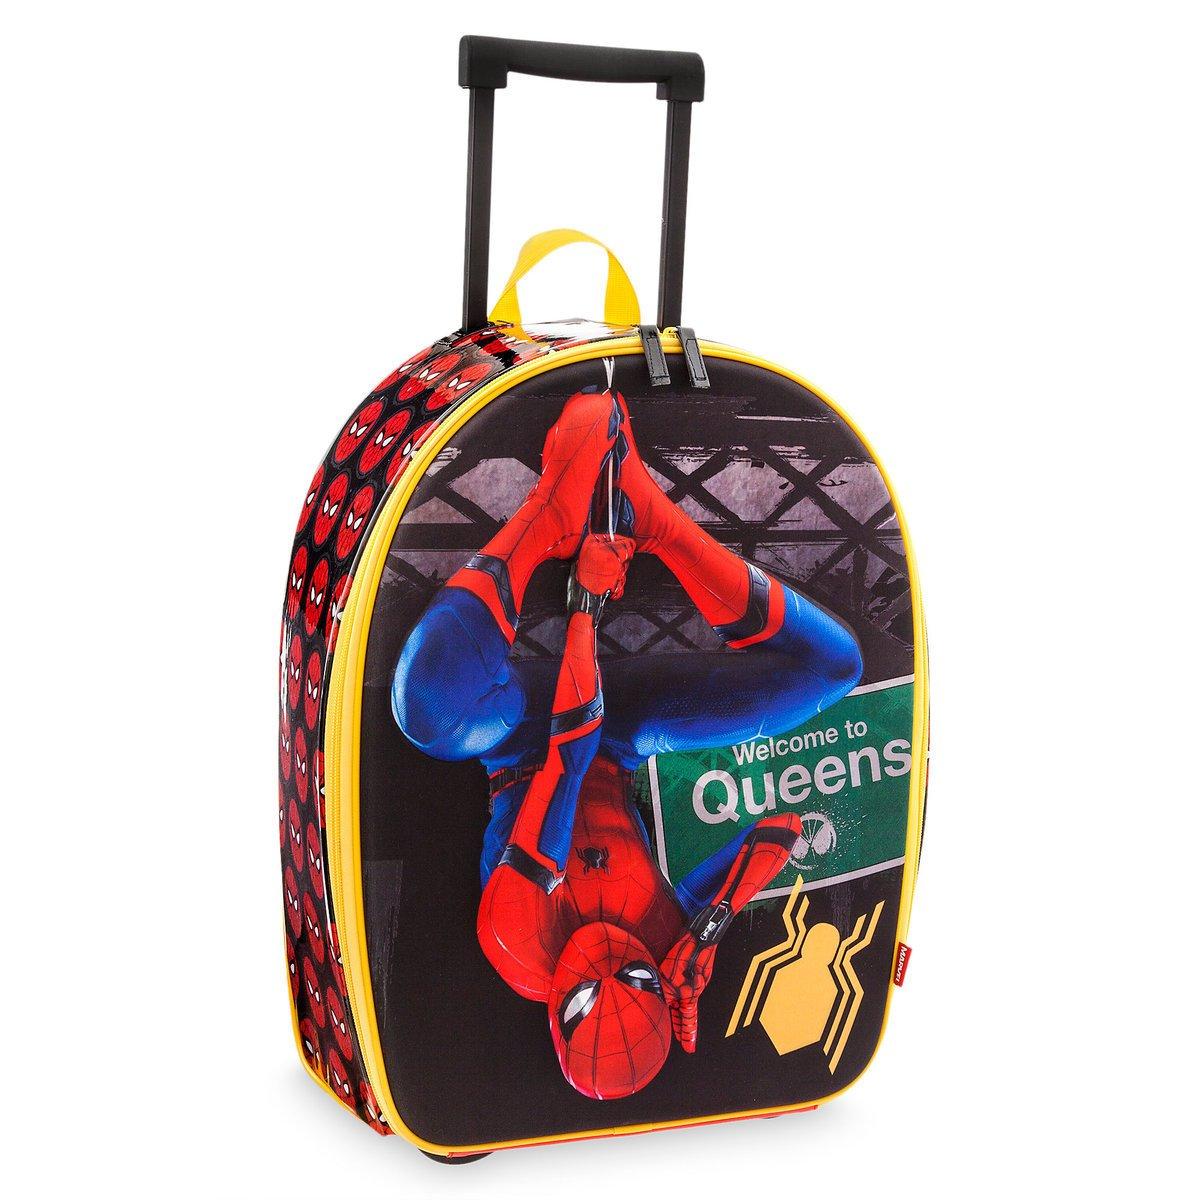 Marvel Disney Store Spider-Man Rolling Luggage Suitcase - Kids Boys